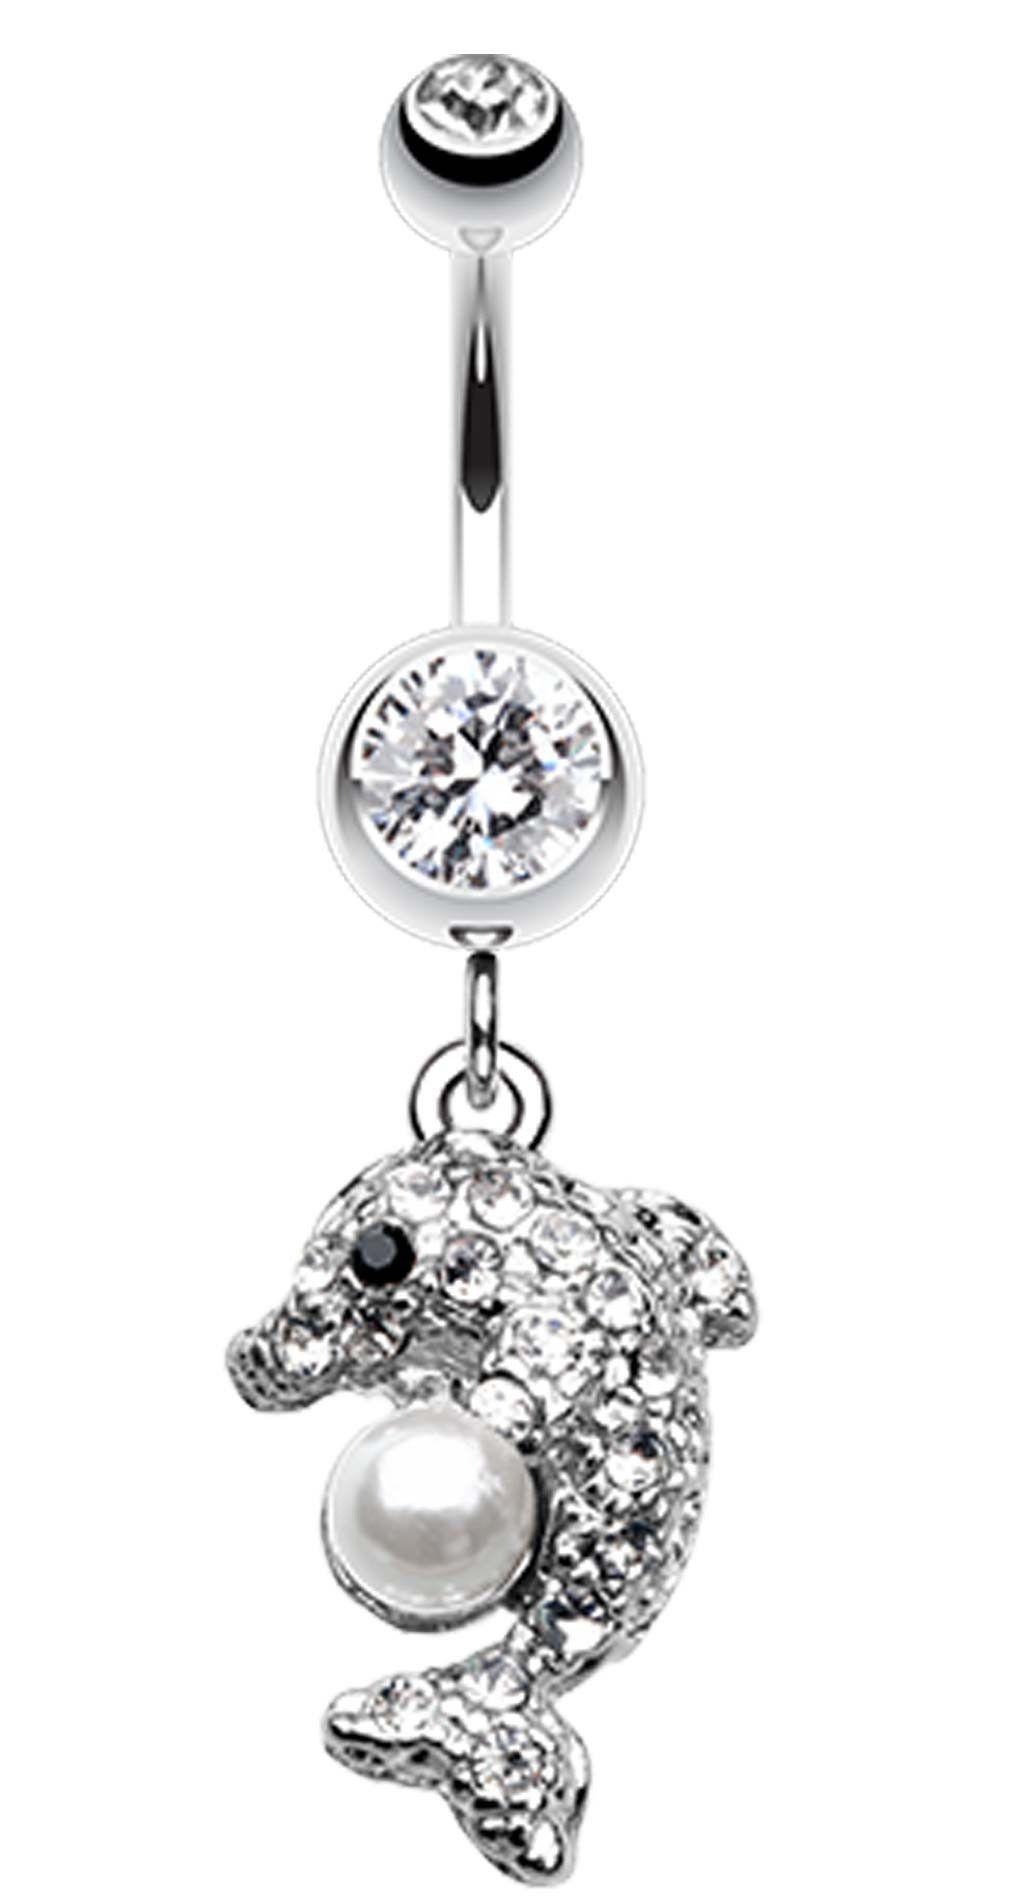 Belly button piercing earrings  Sparkling Dolphin Belly Button Ring  Belly button